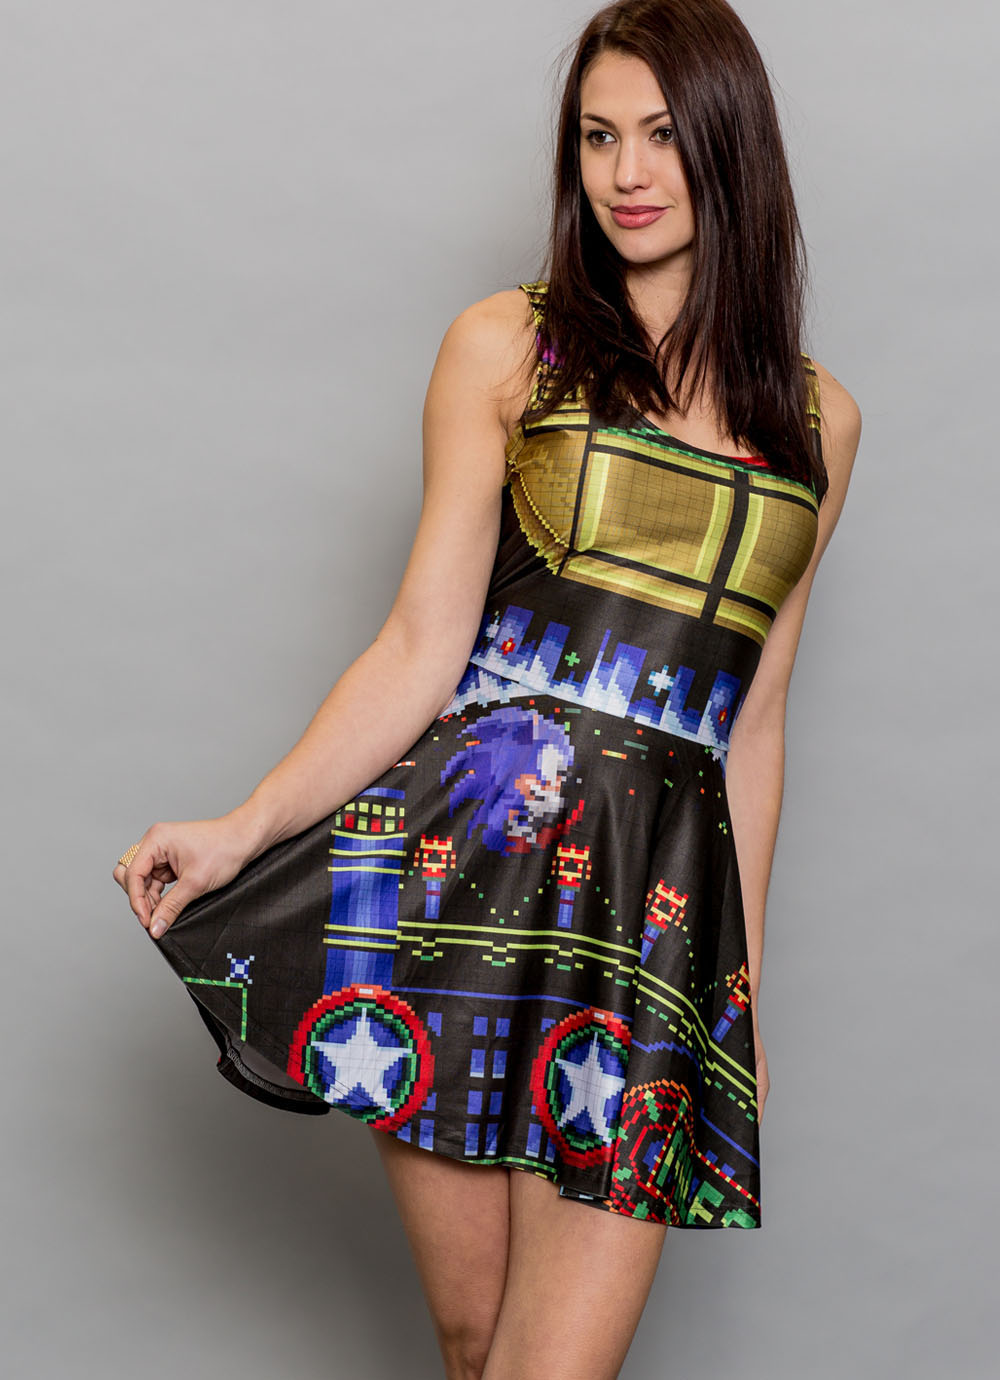 Sonic Dress Up